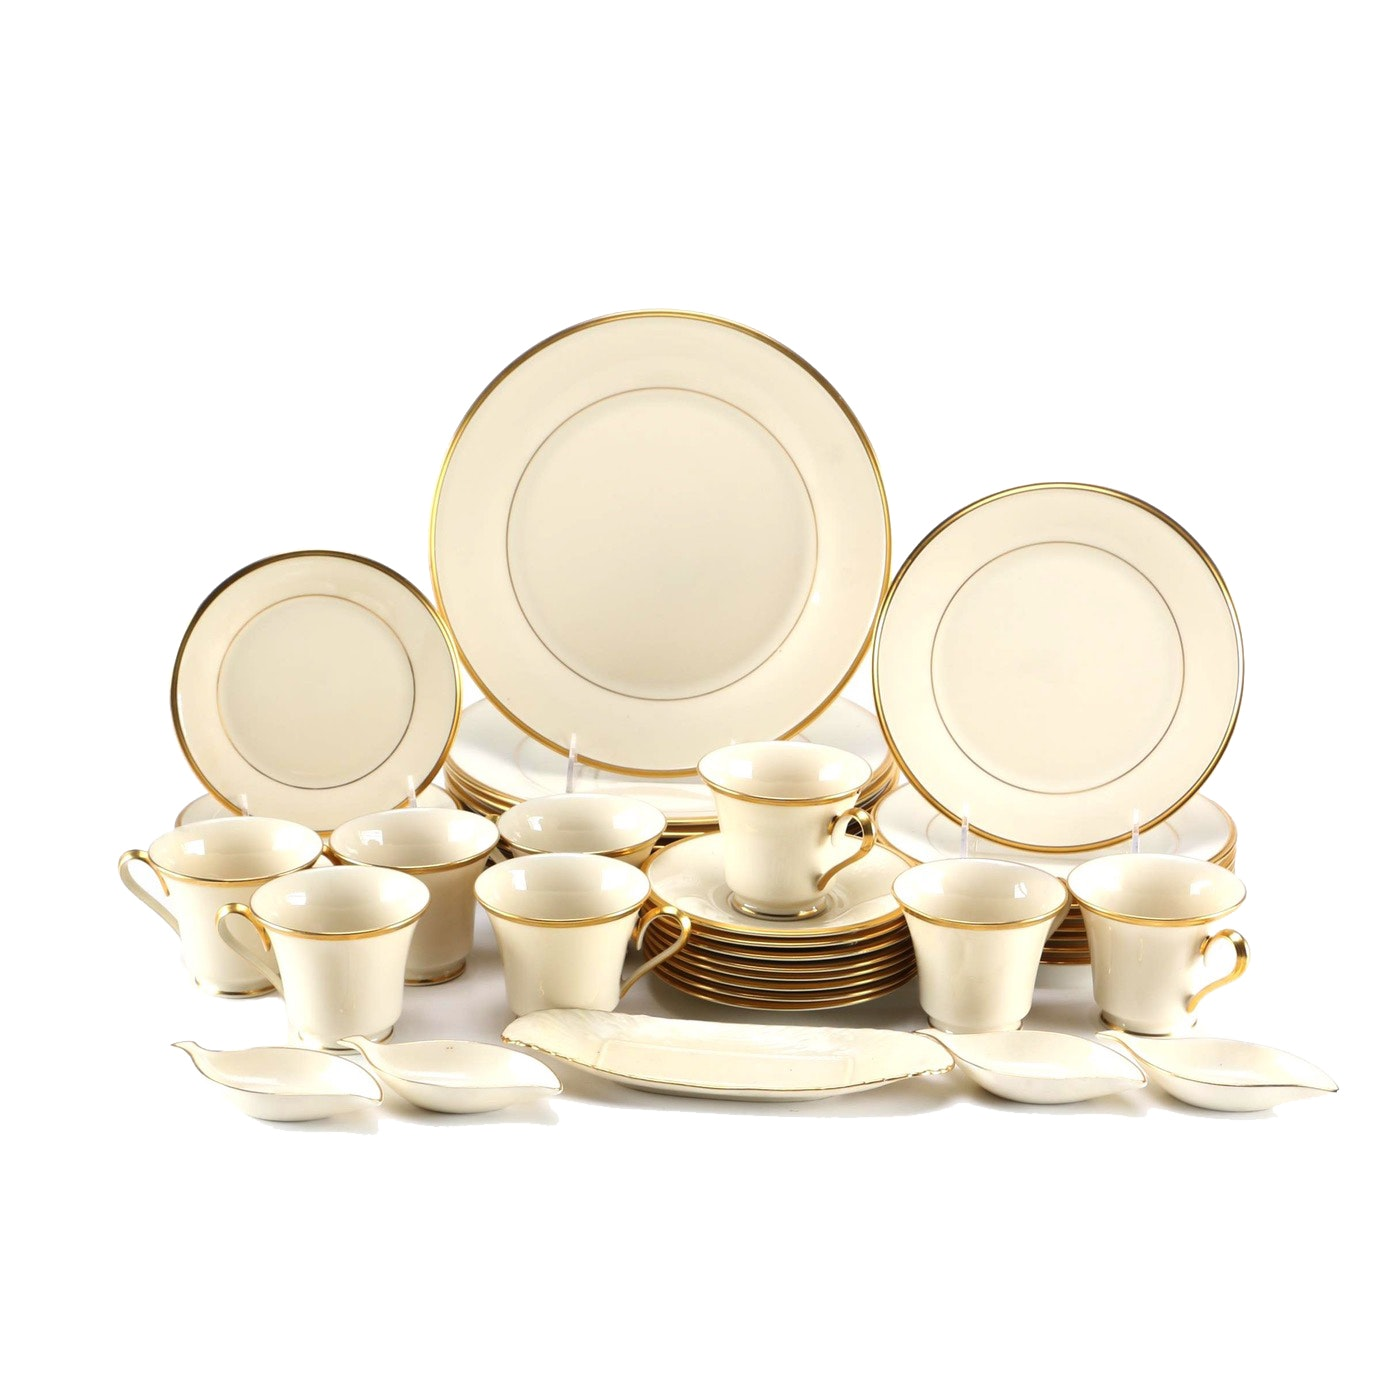 "Set of Lenox ""Eternal"" Porcelain Tableware with 24K Gold"